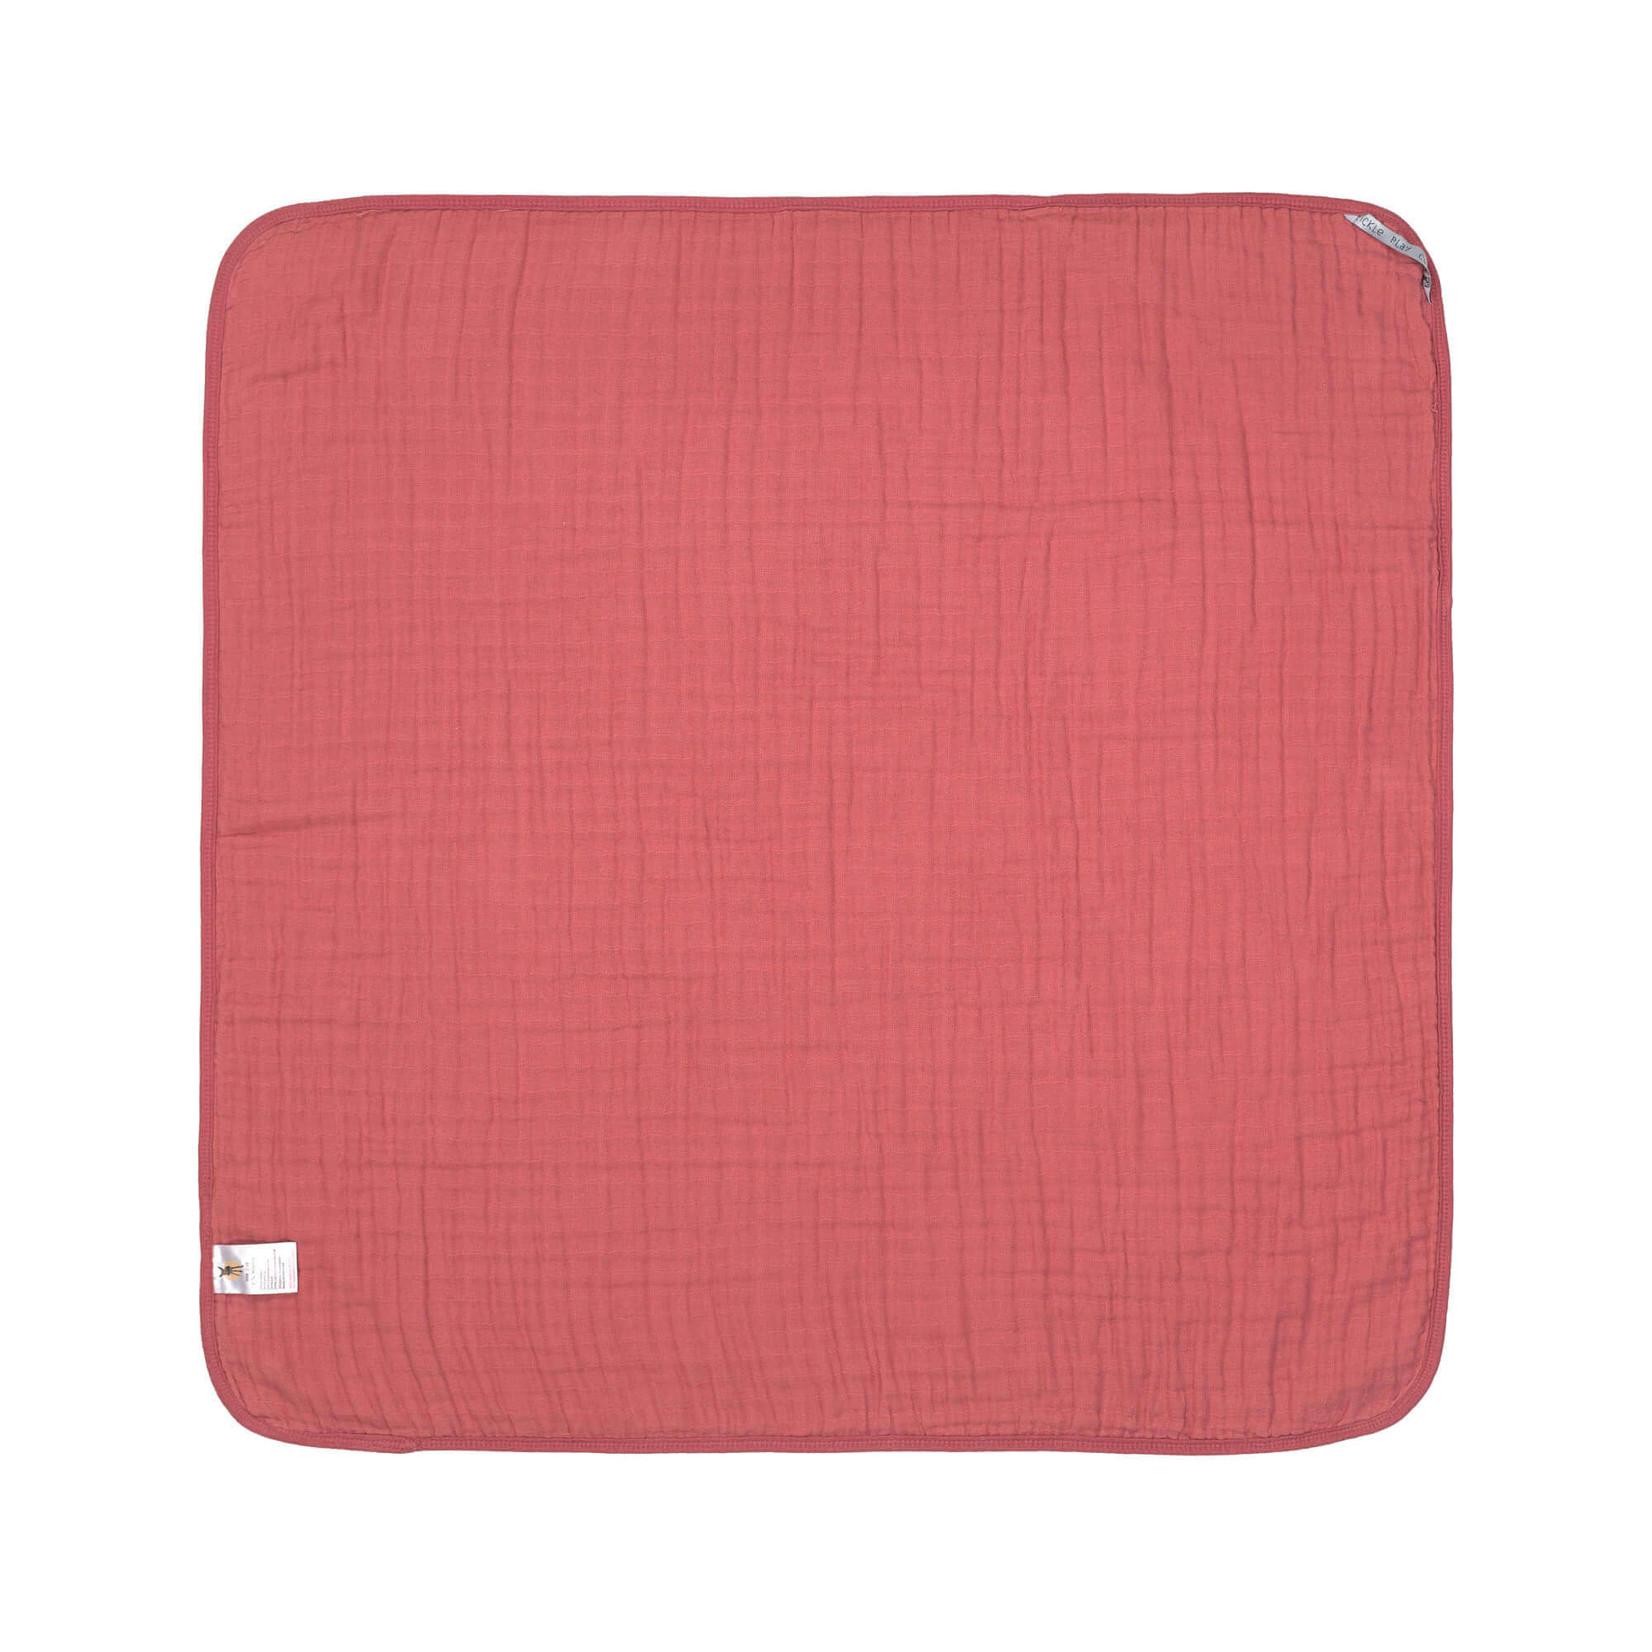 Lässig Muslin Hooded Towel